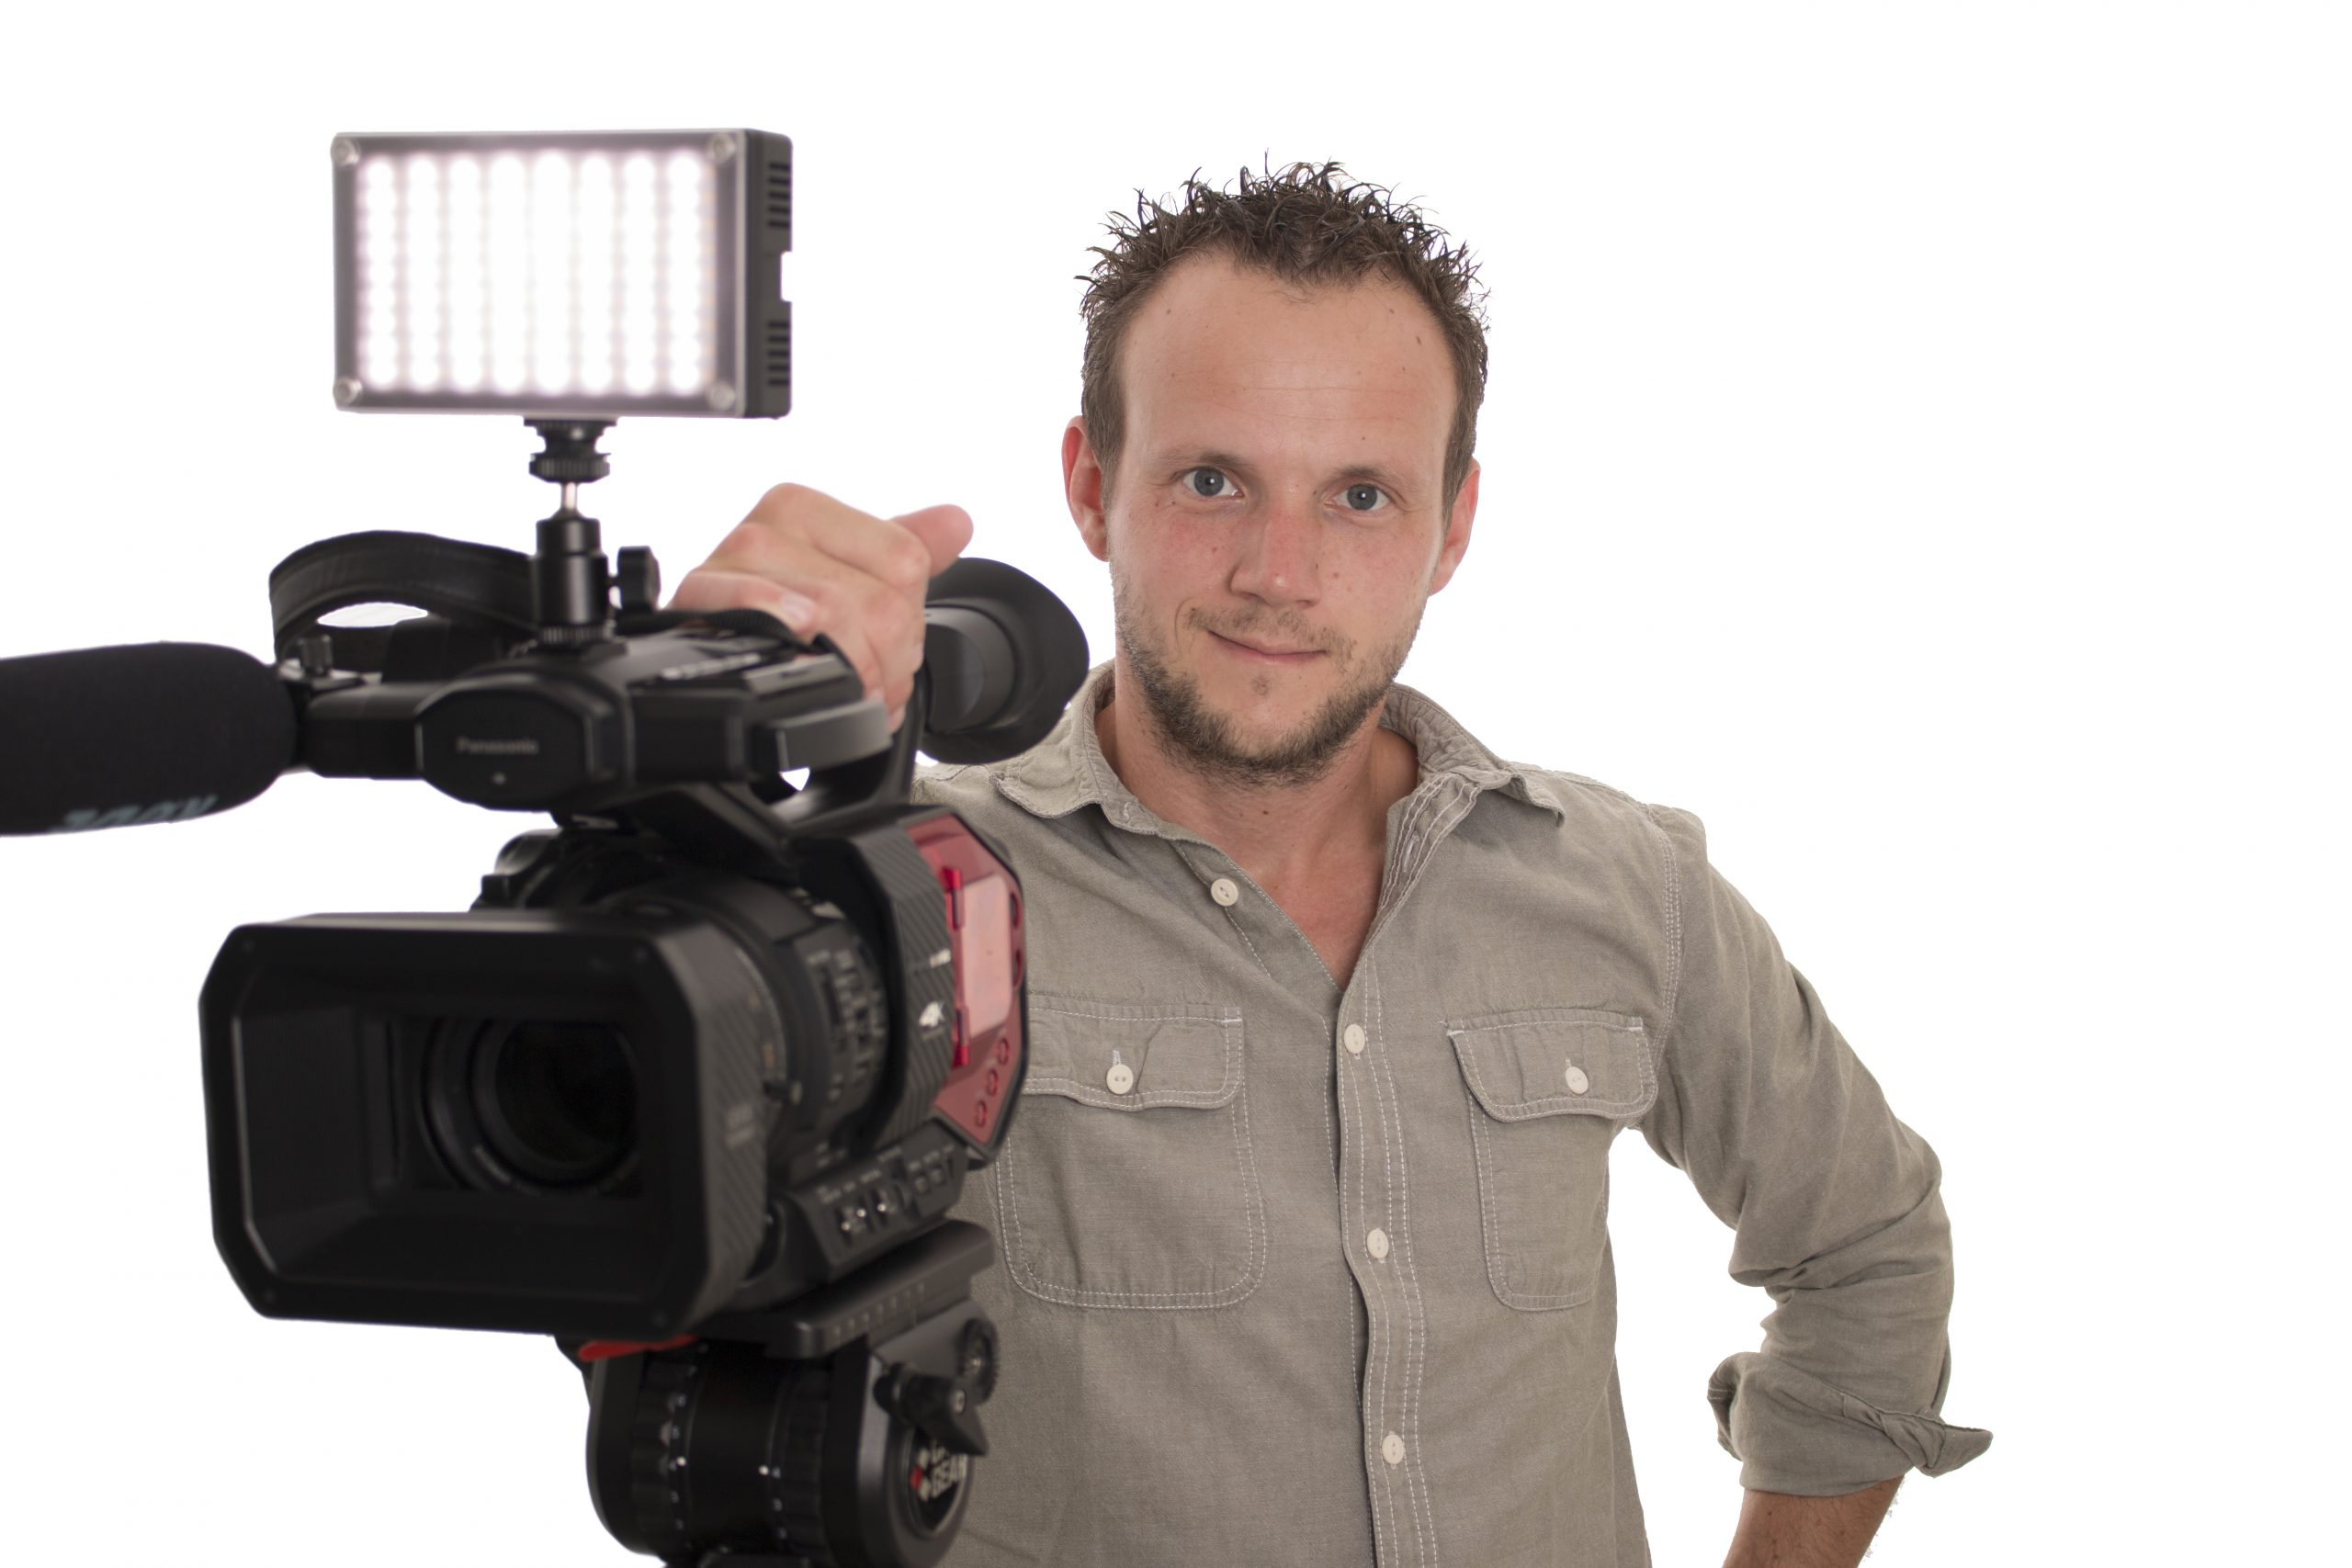 Cameraman Dirk Hendriksen